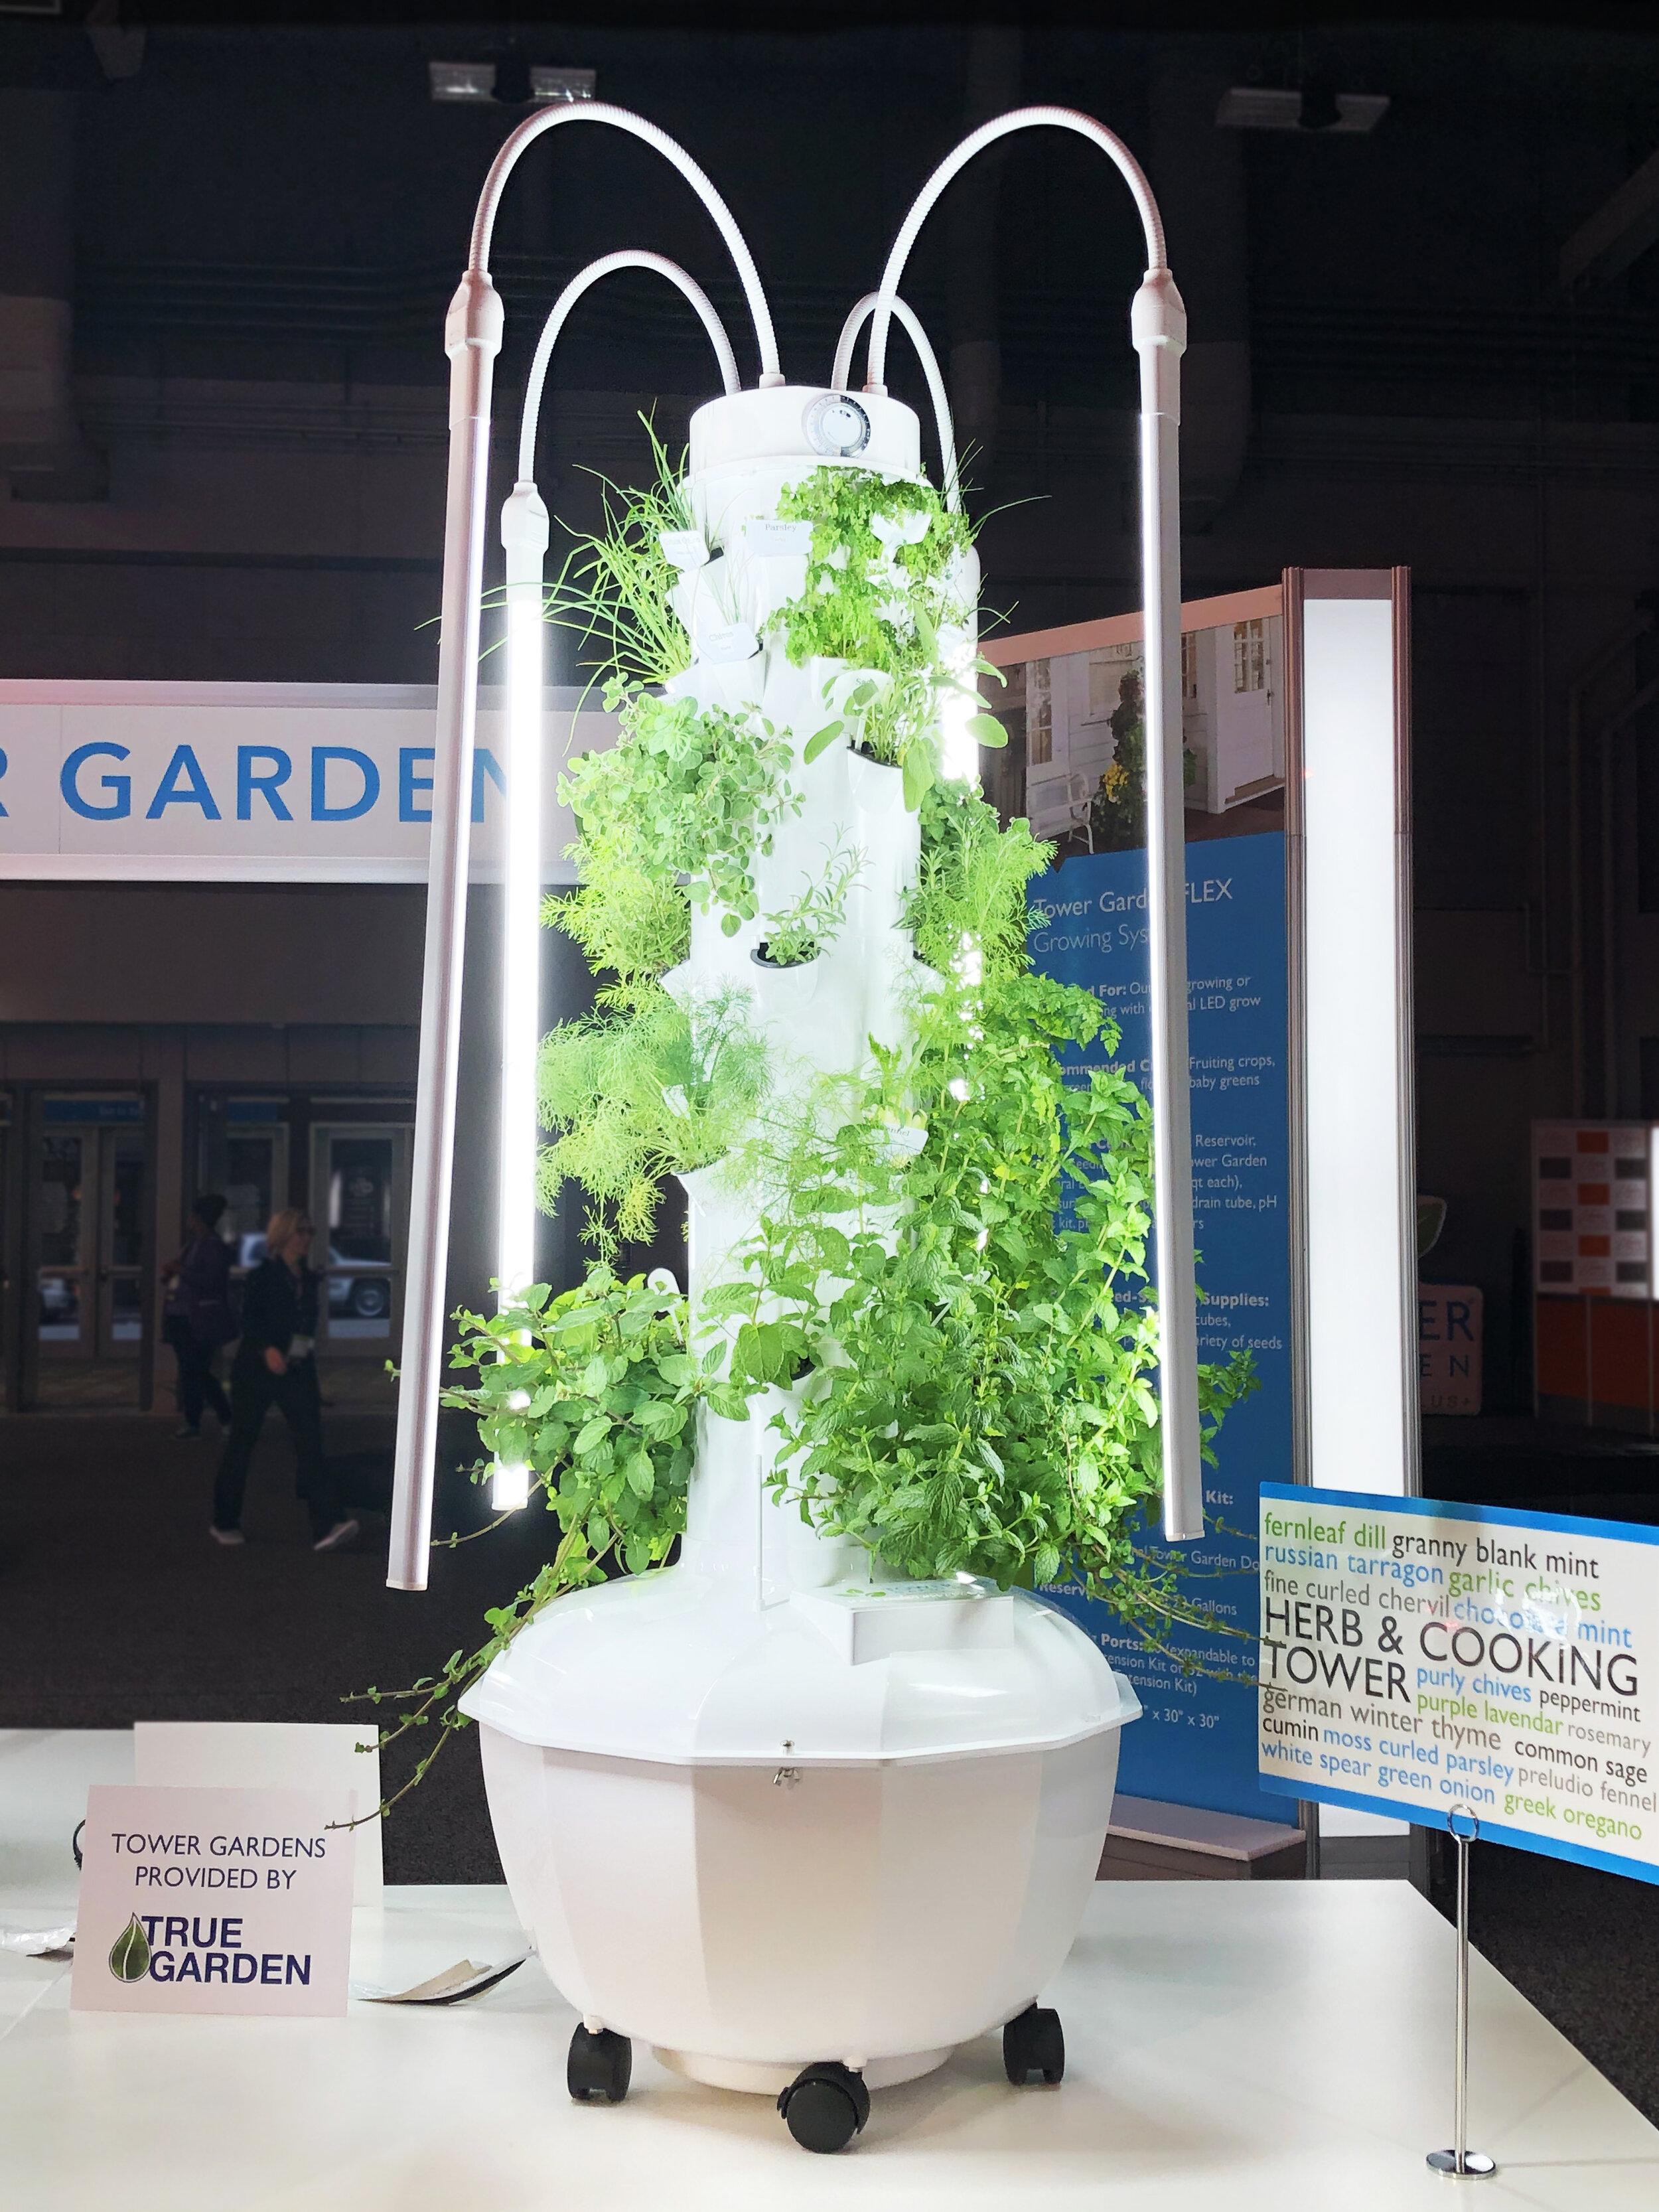 Tower_Garden_Vertical_Garden_Growing_Shop_.jpg